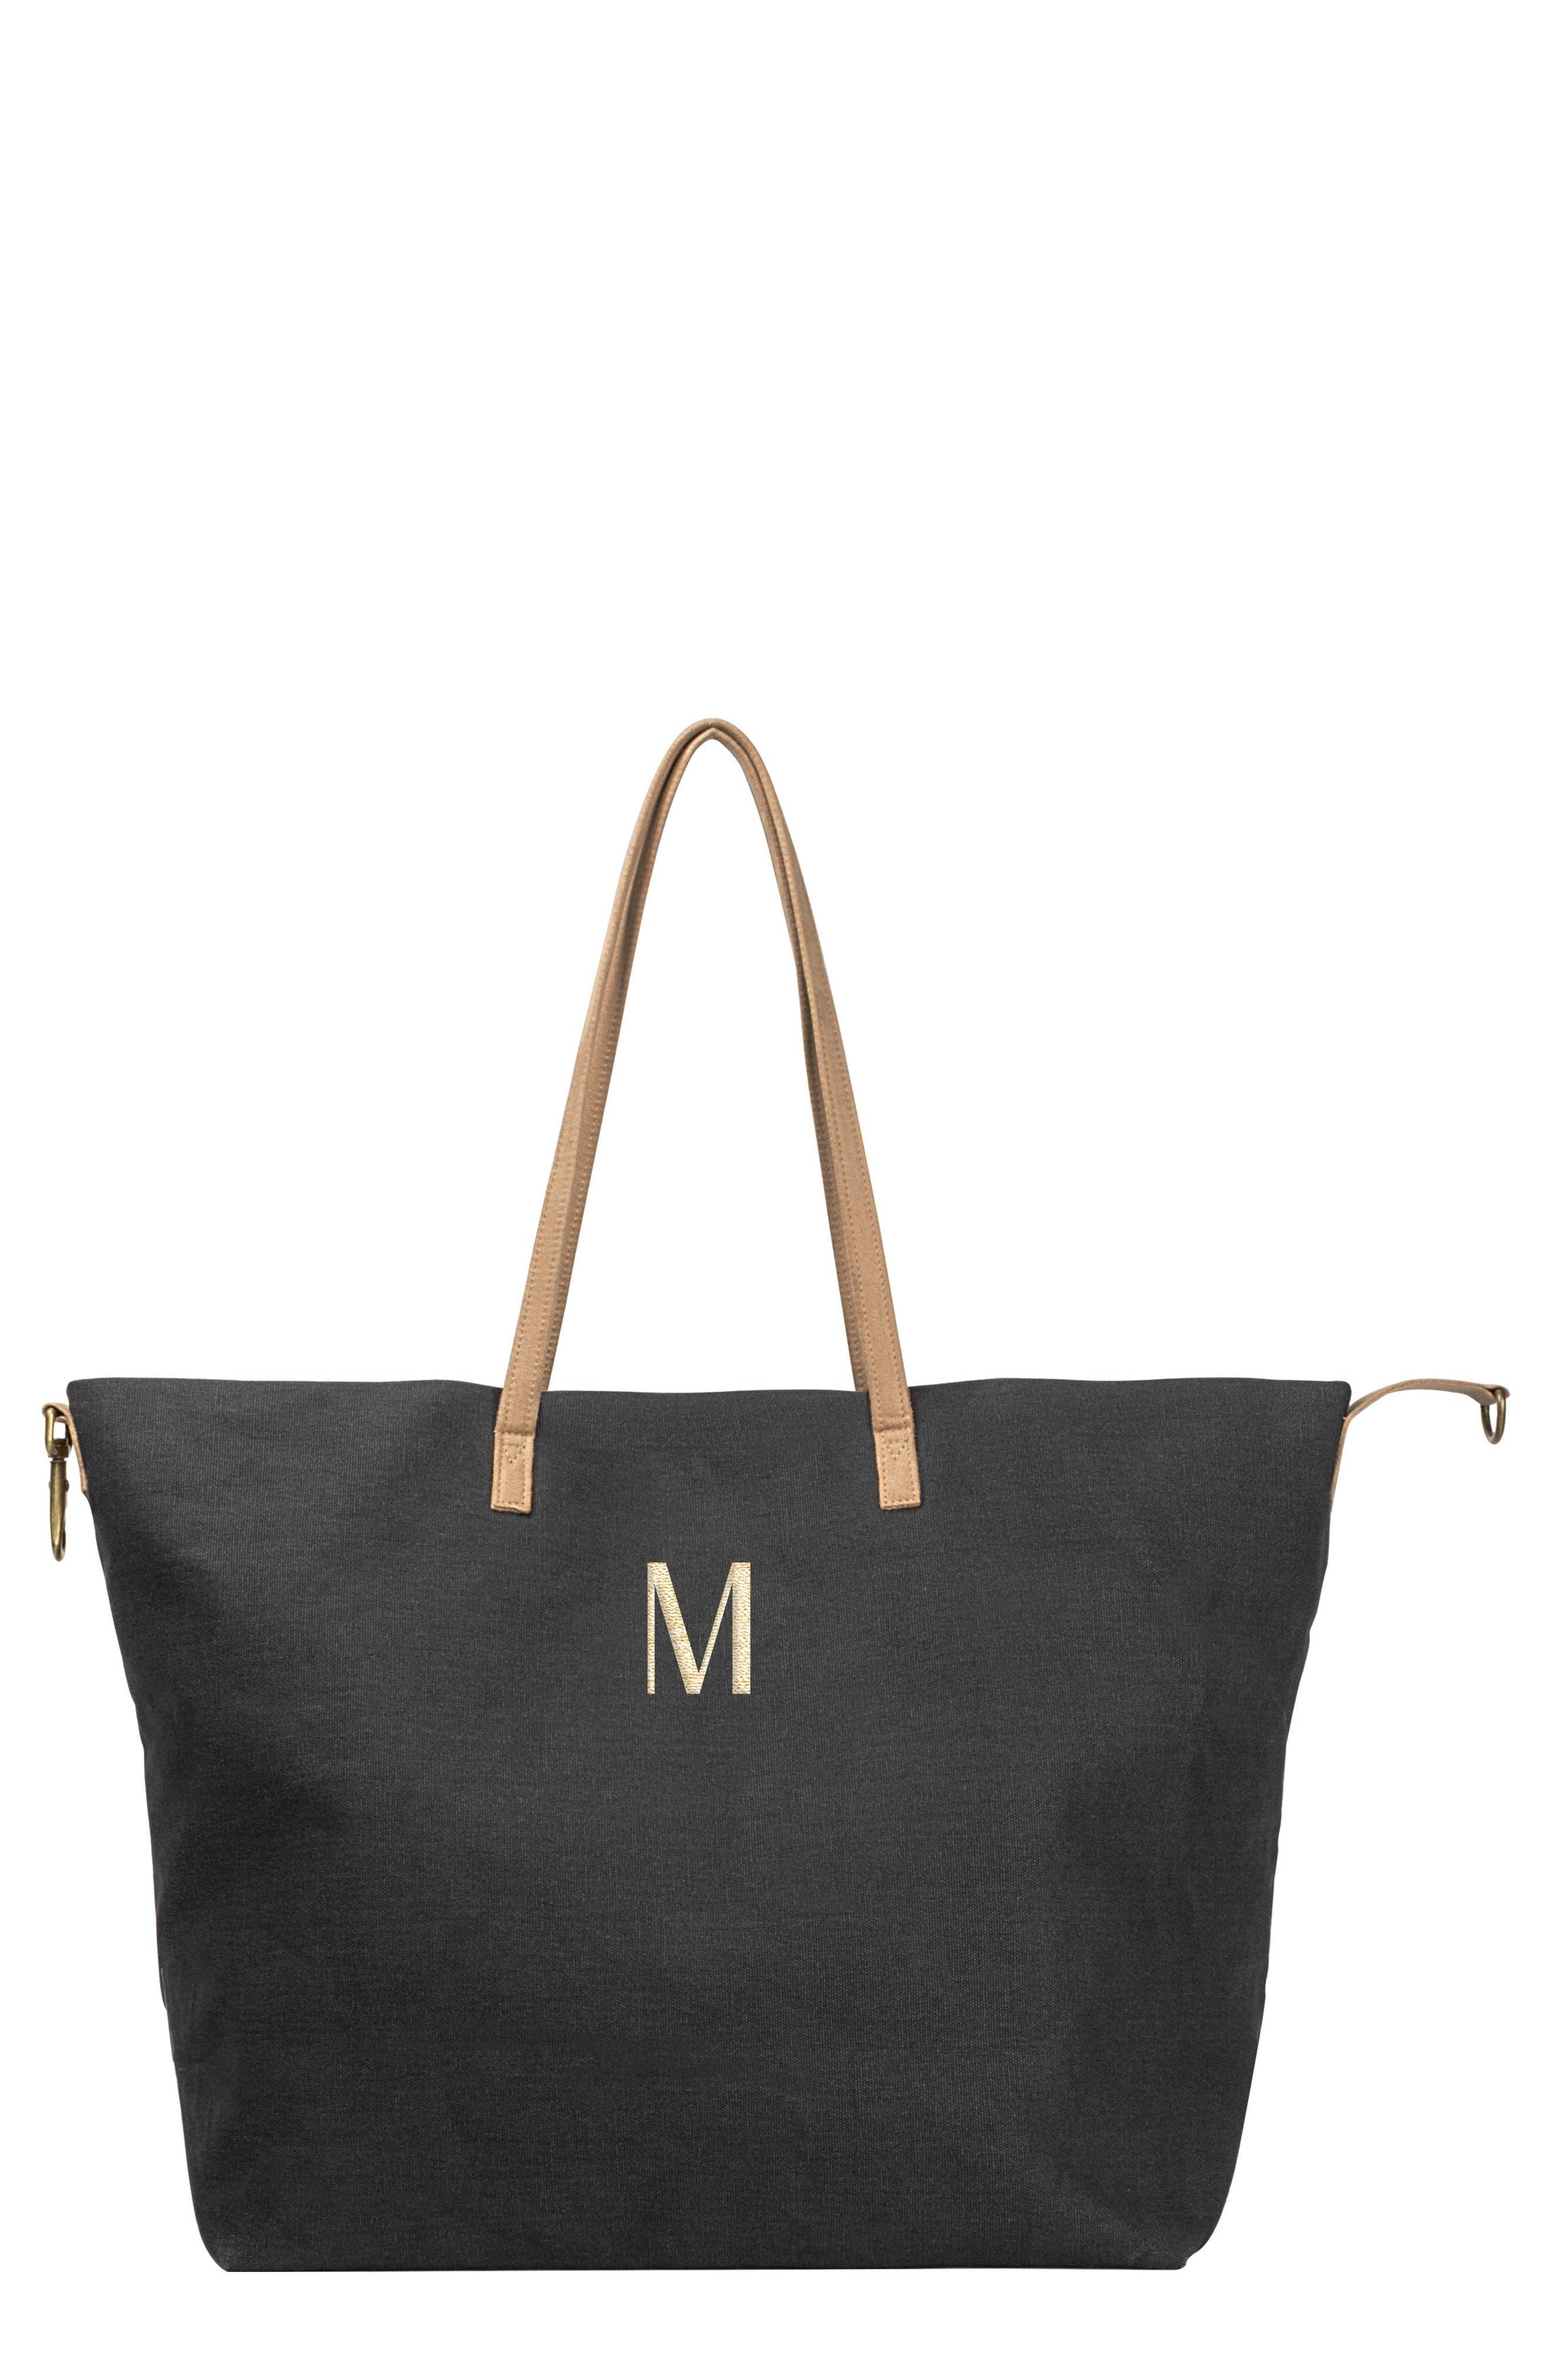 Monogram Overnight Tote,                         Main,                         color, Black M